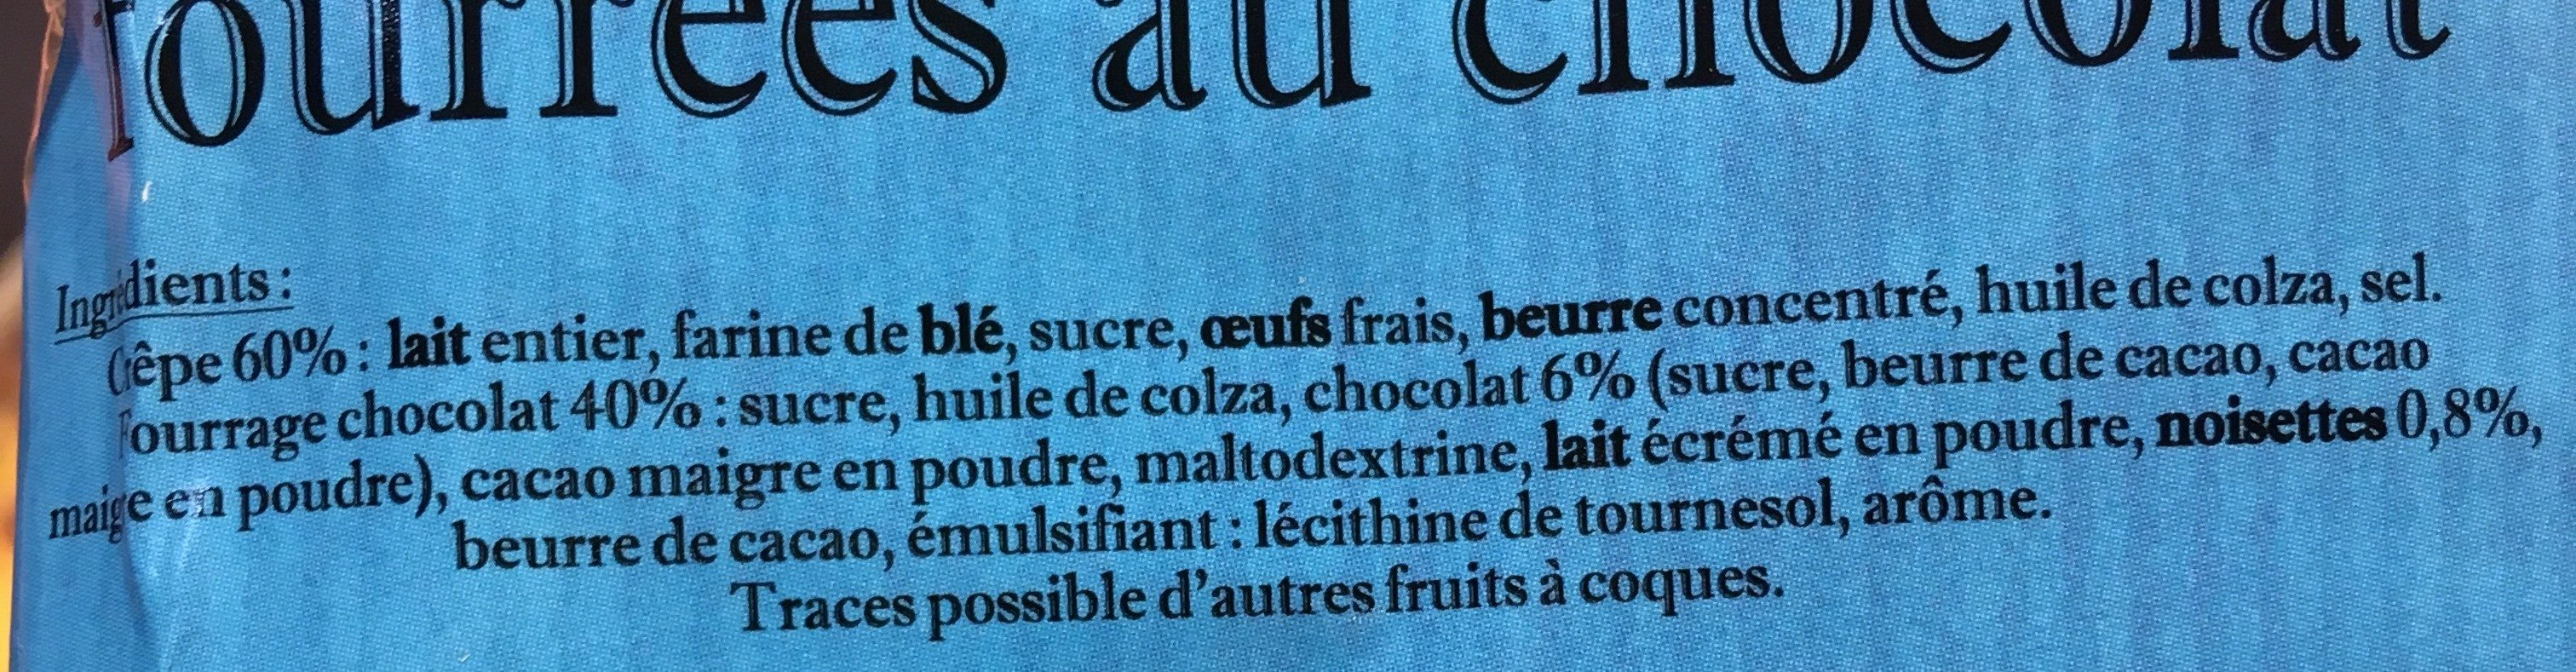 Crêpes fourées chocolat - Ingredients